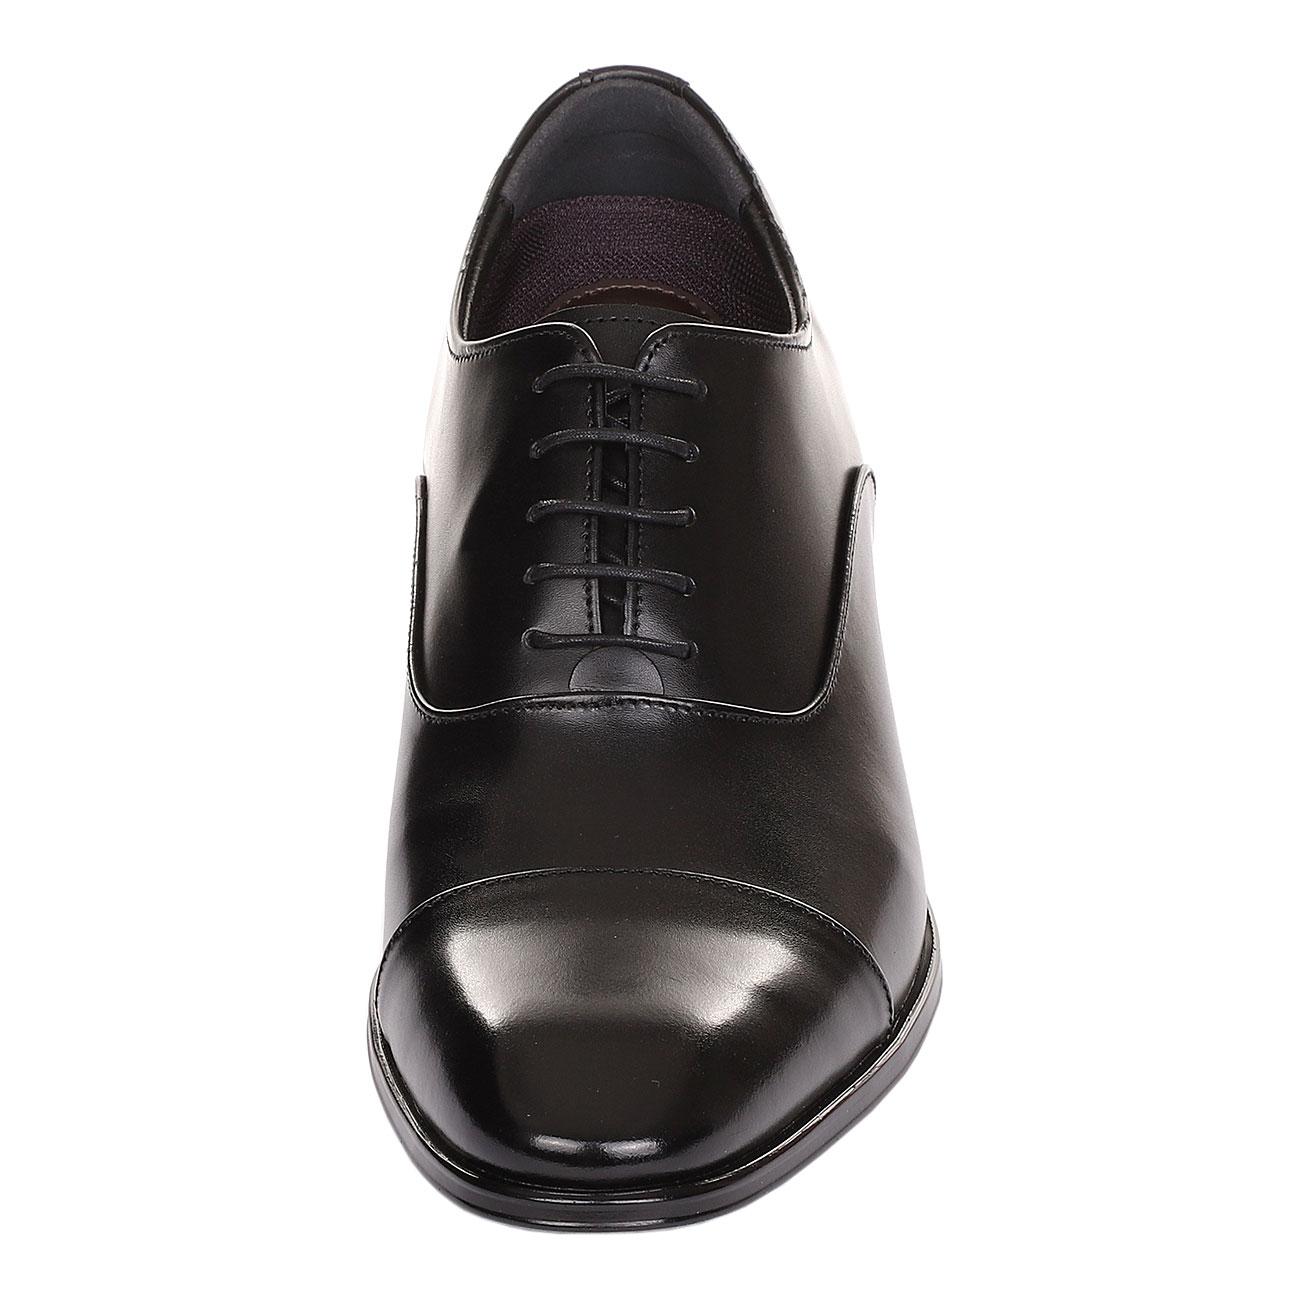 Classic A Cap-Toe Oxford Shoe With A Semi Glossy Formal, Elegant & Dressy-1